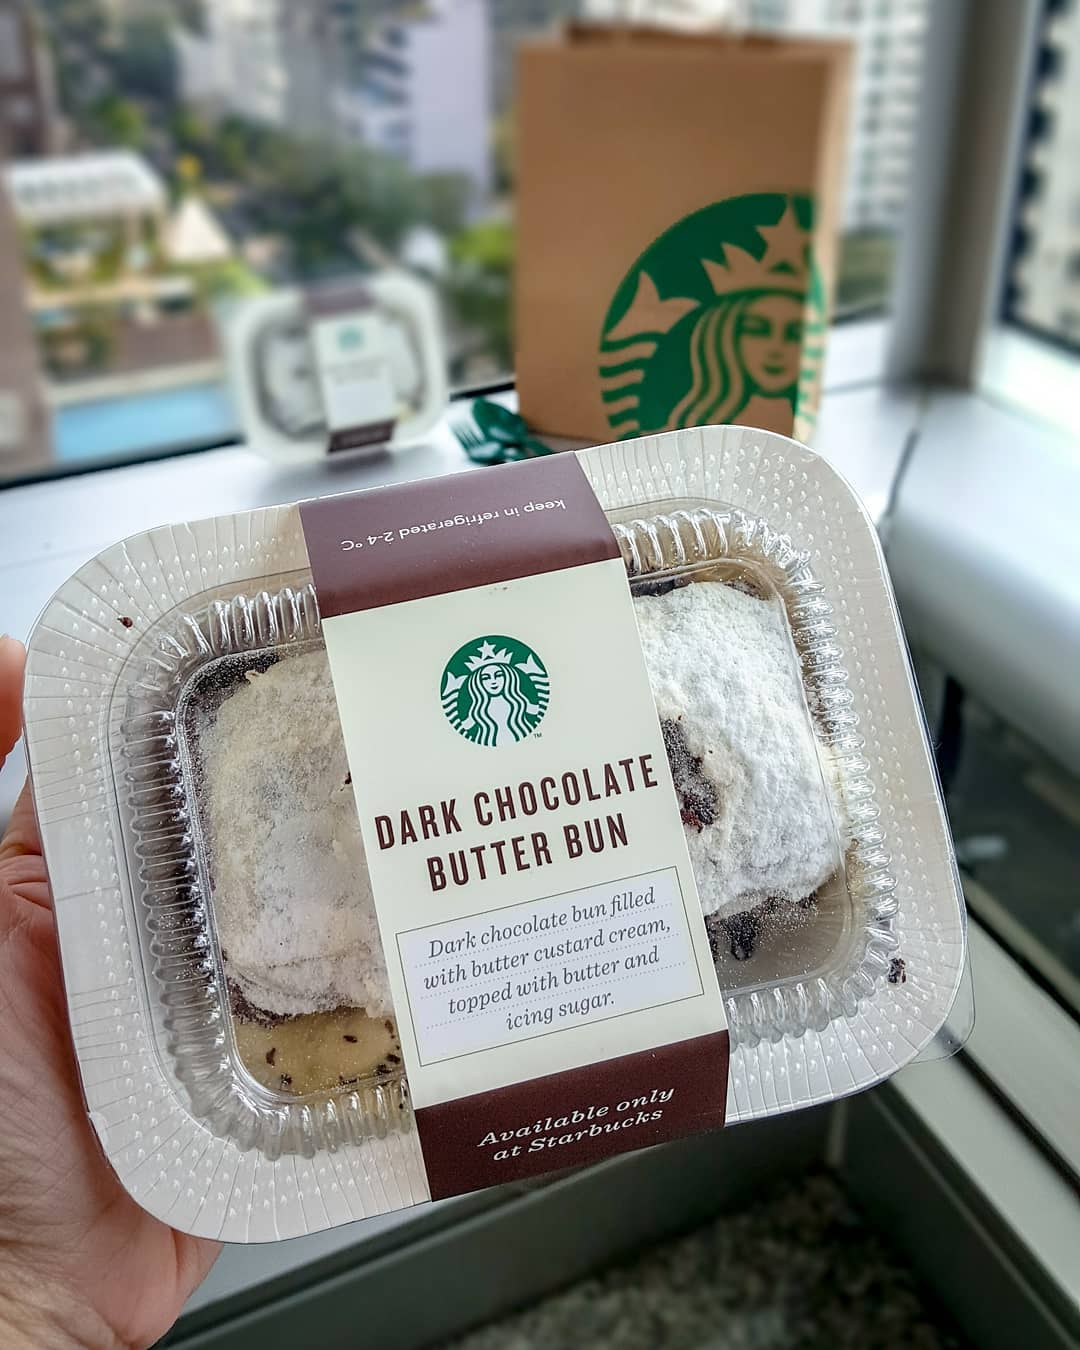 Starbucks Dark Chocolate Butter Bun